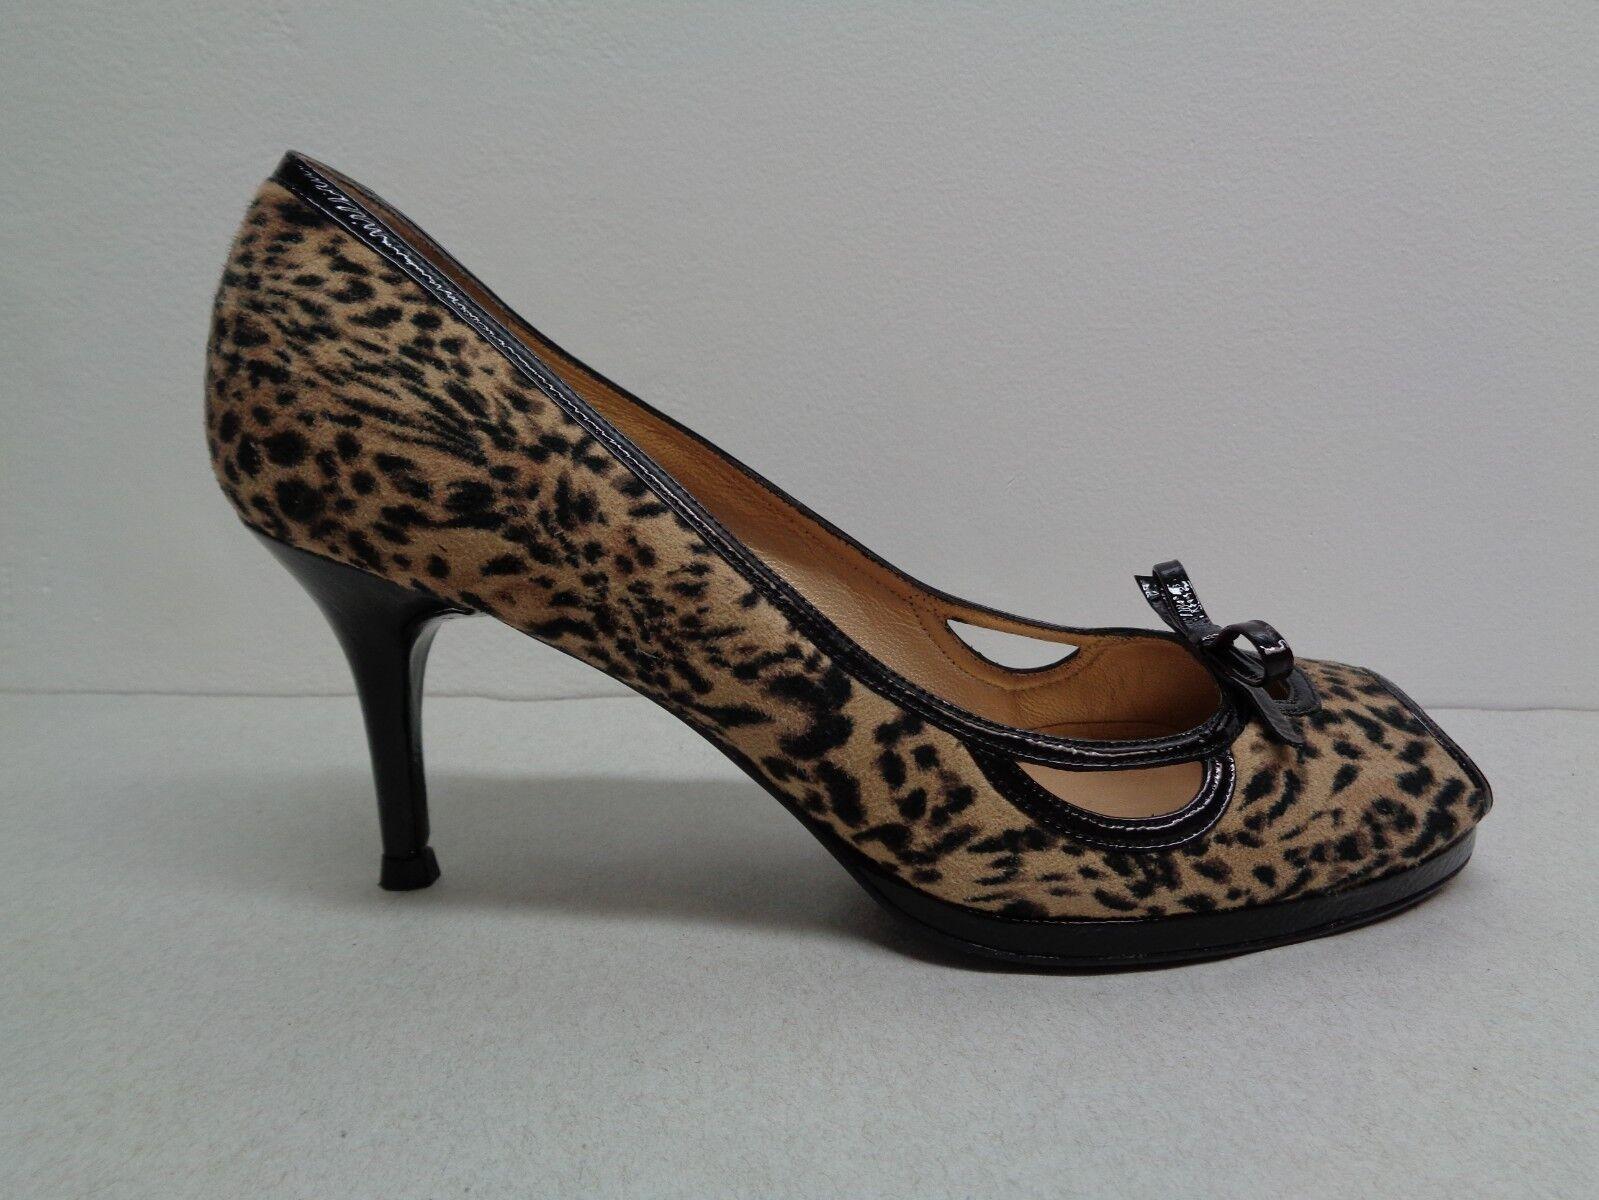 Stuart Weitzman Größe 6 M BECON Leopard Print Leather Heels Heels Heels New damen schuhe 5129b6